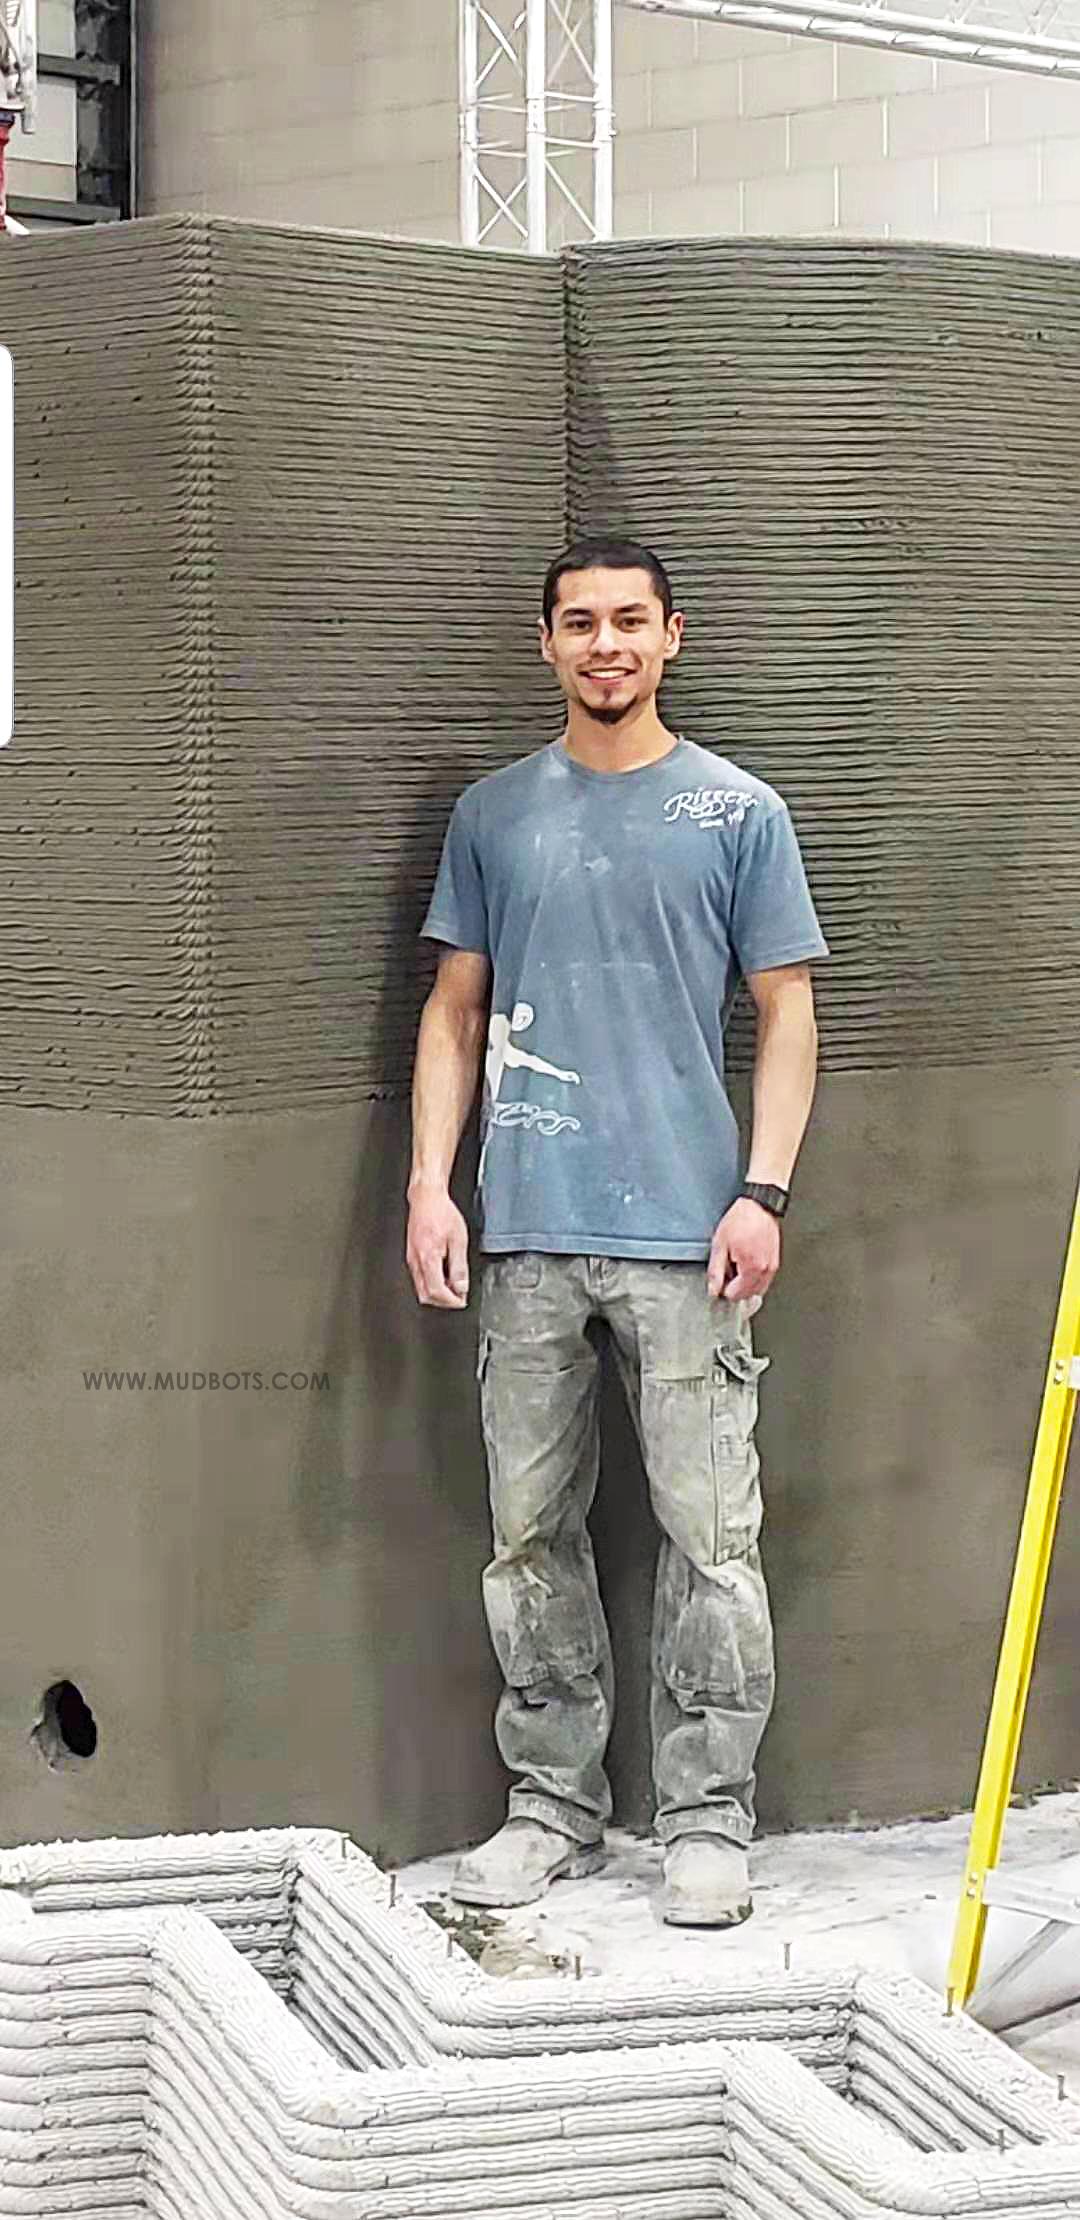 3D Concrete Printing 8 Feet Walls